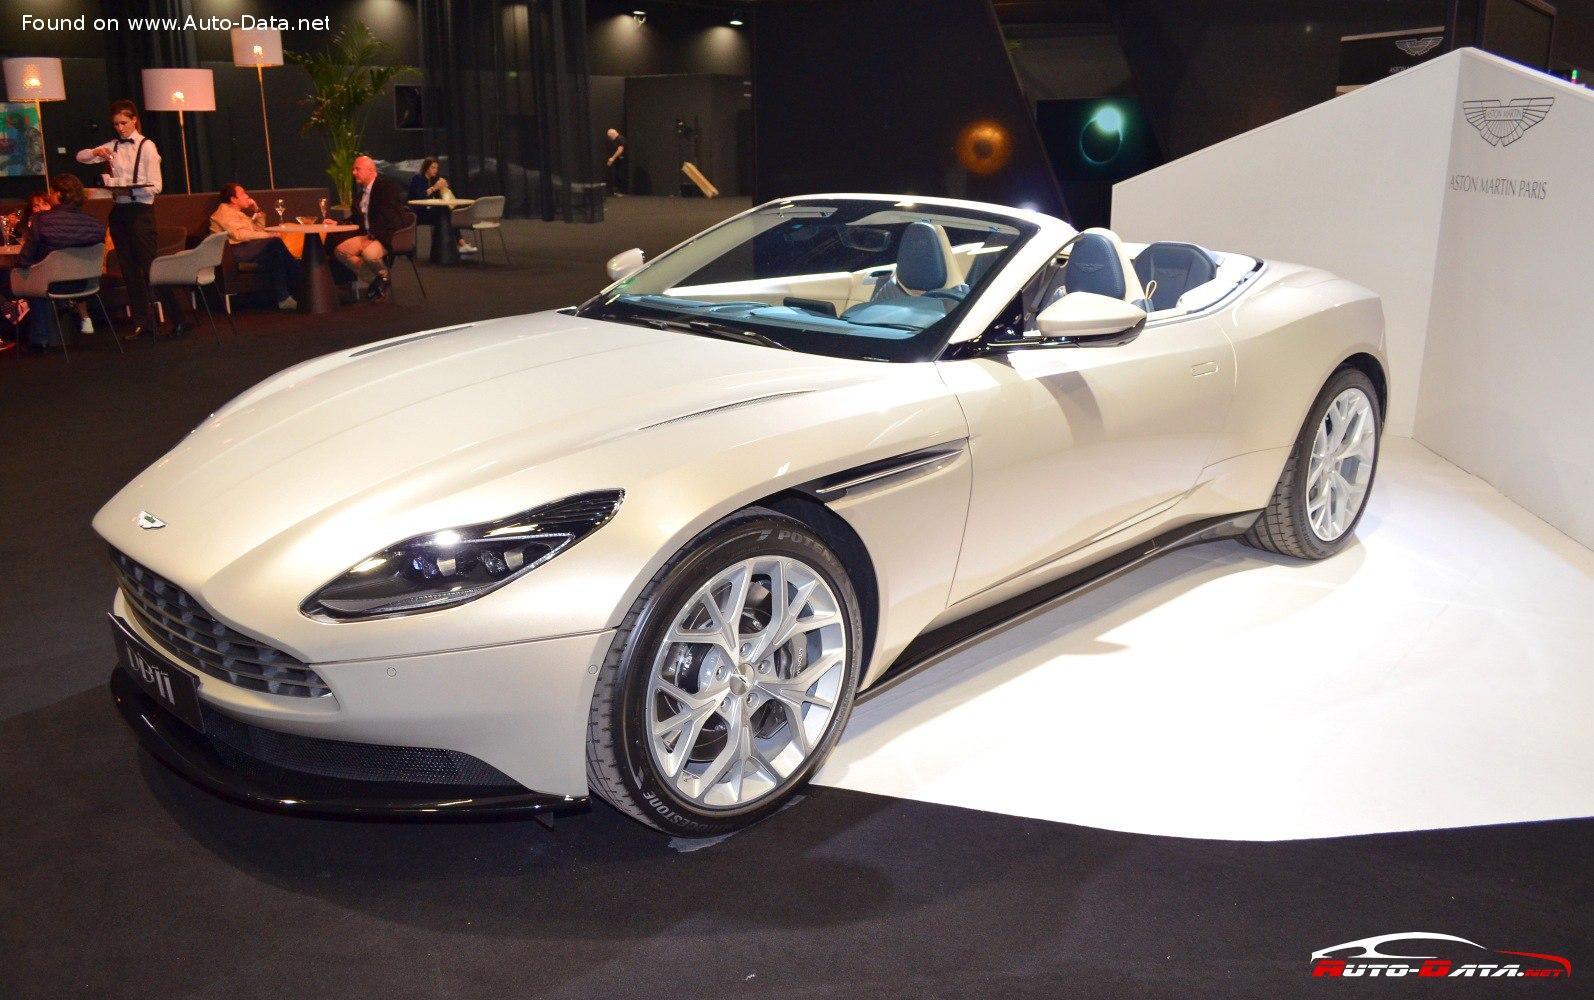 Aston Martin Db11 Technical Specs Fuel Consumption Dimensions